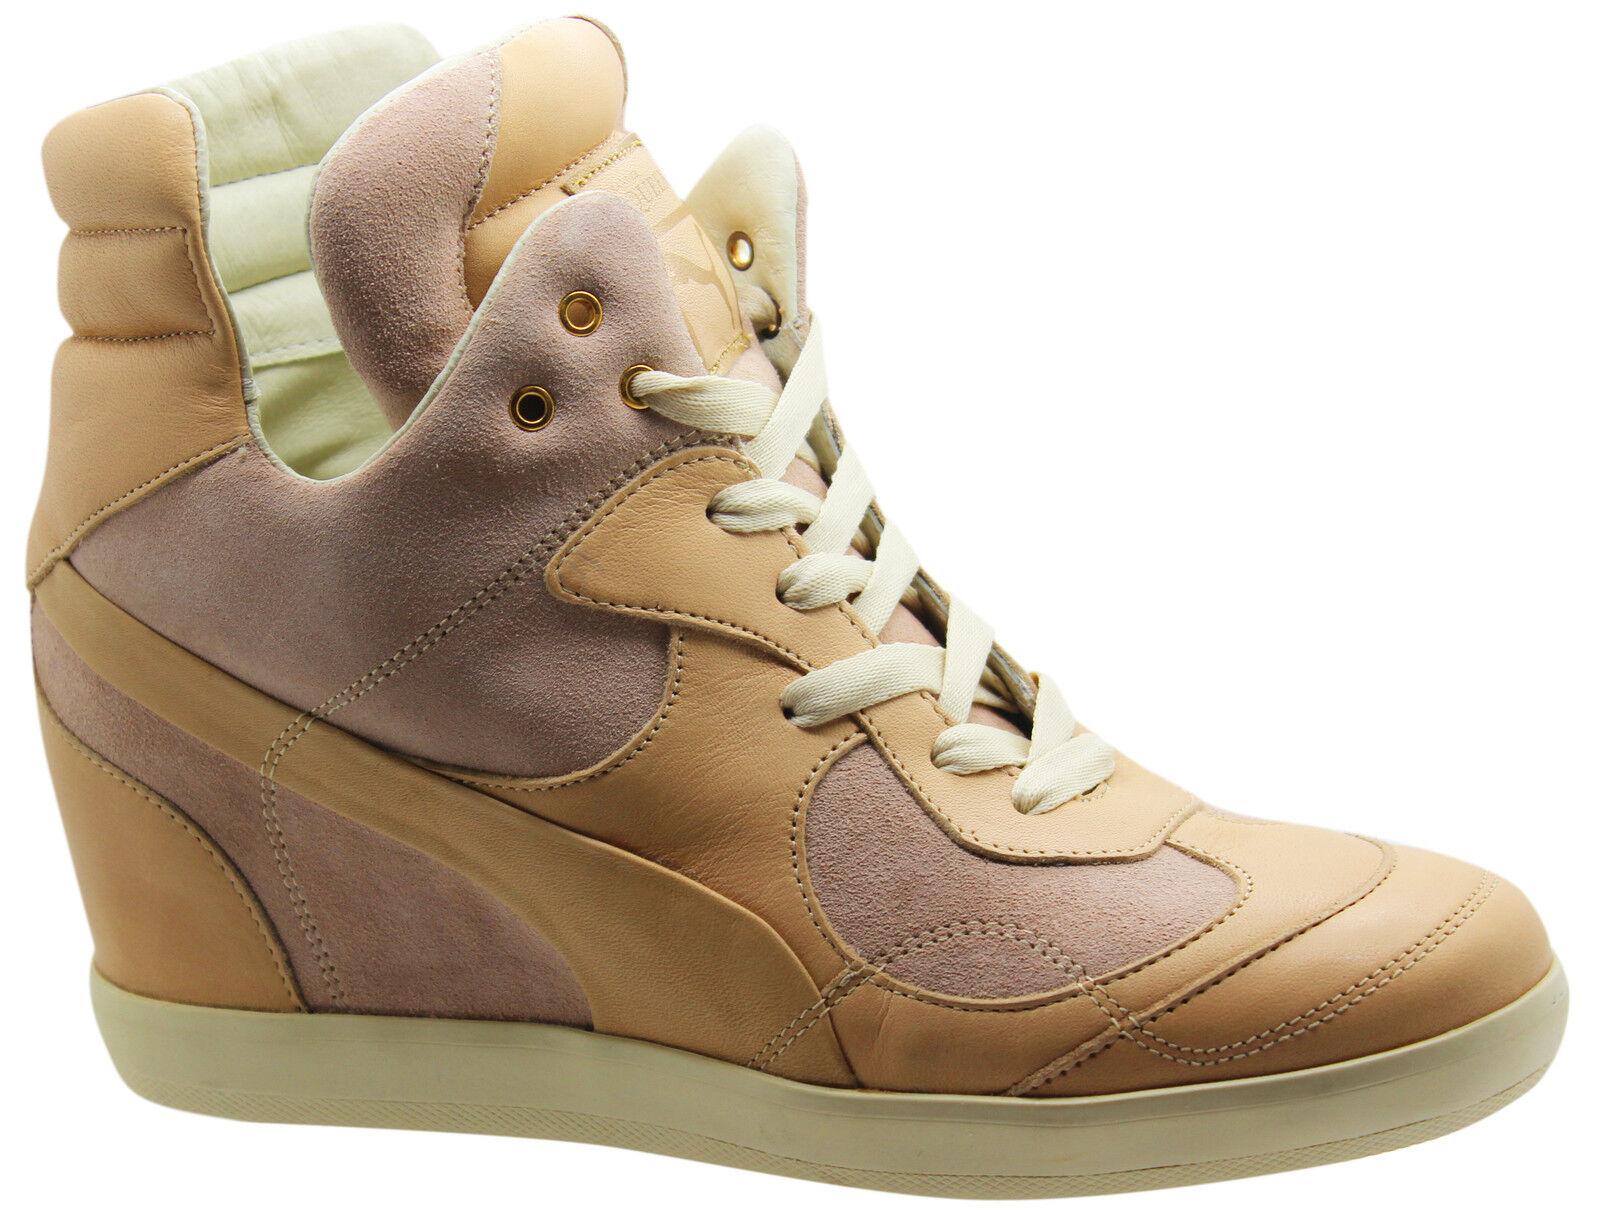 Puma Alexander Mcqueen Ofeya Ofeya Ofeya Talon Caché Compensé Chaussures pour Femmes 950c4b